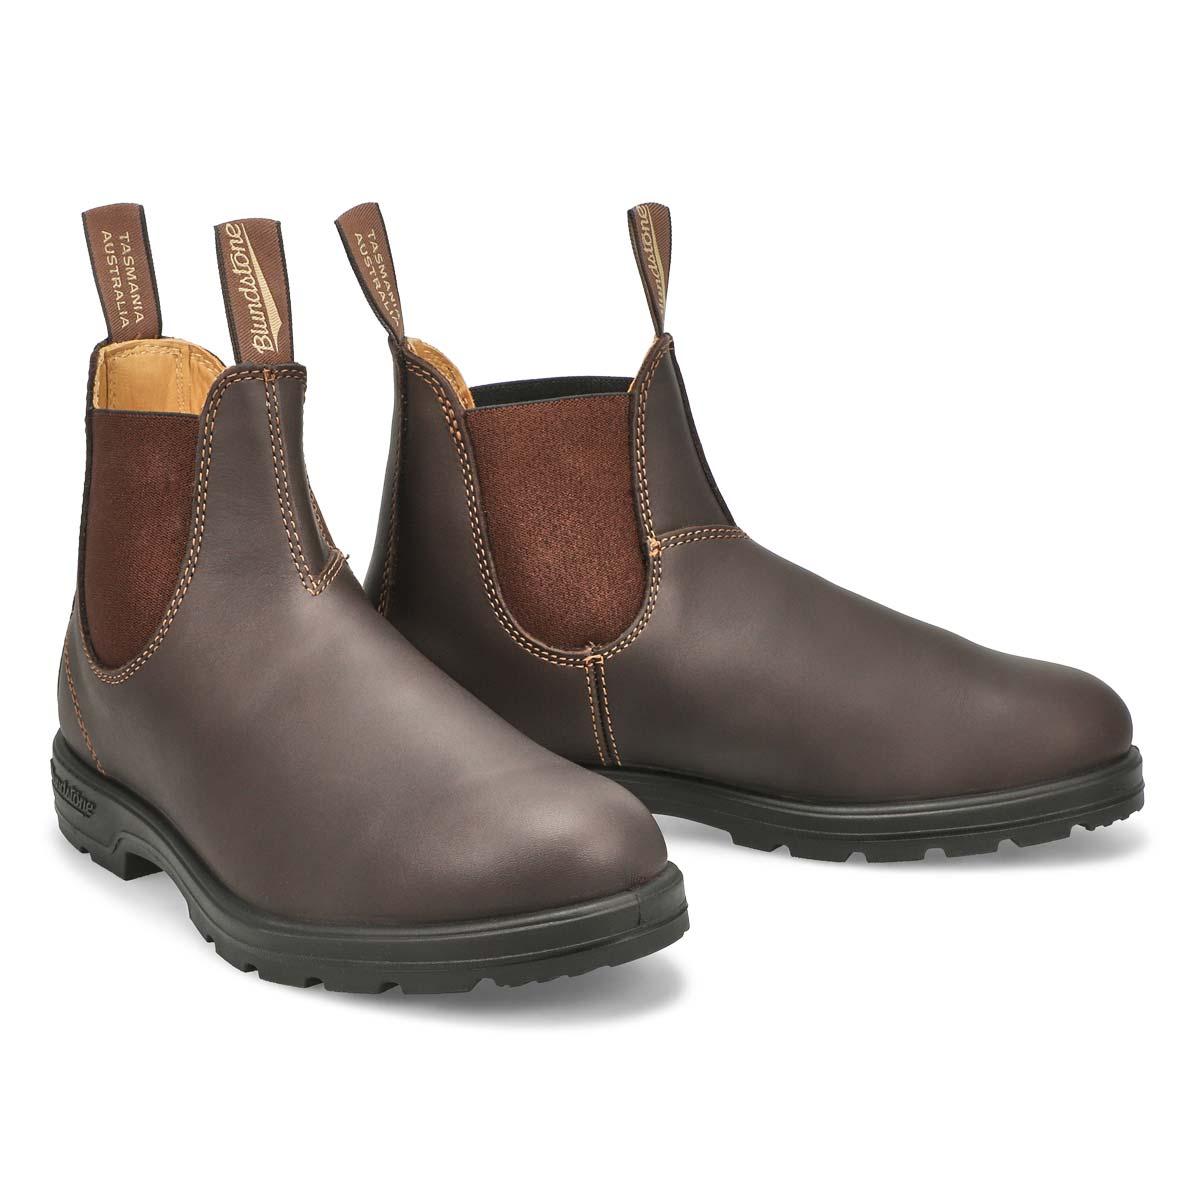 Unisex Original walnut twin gore boot